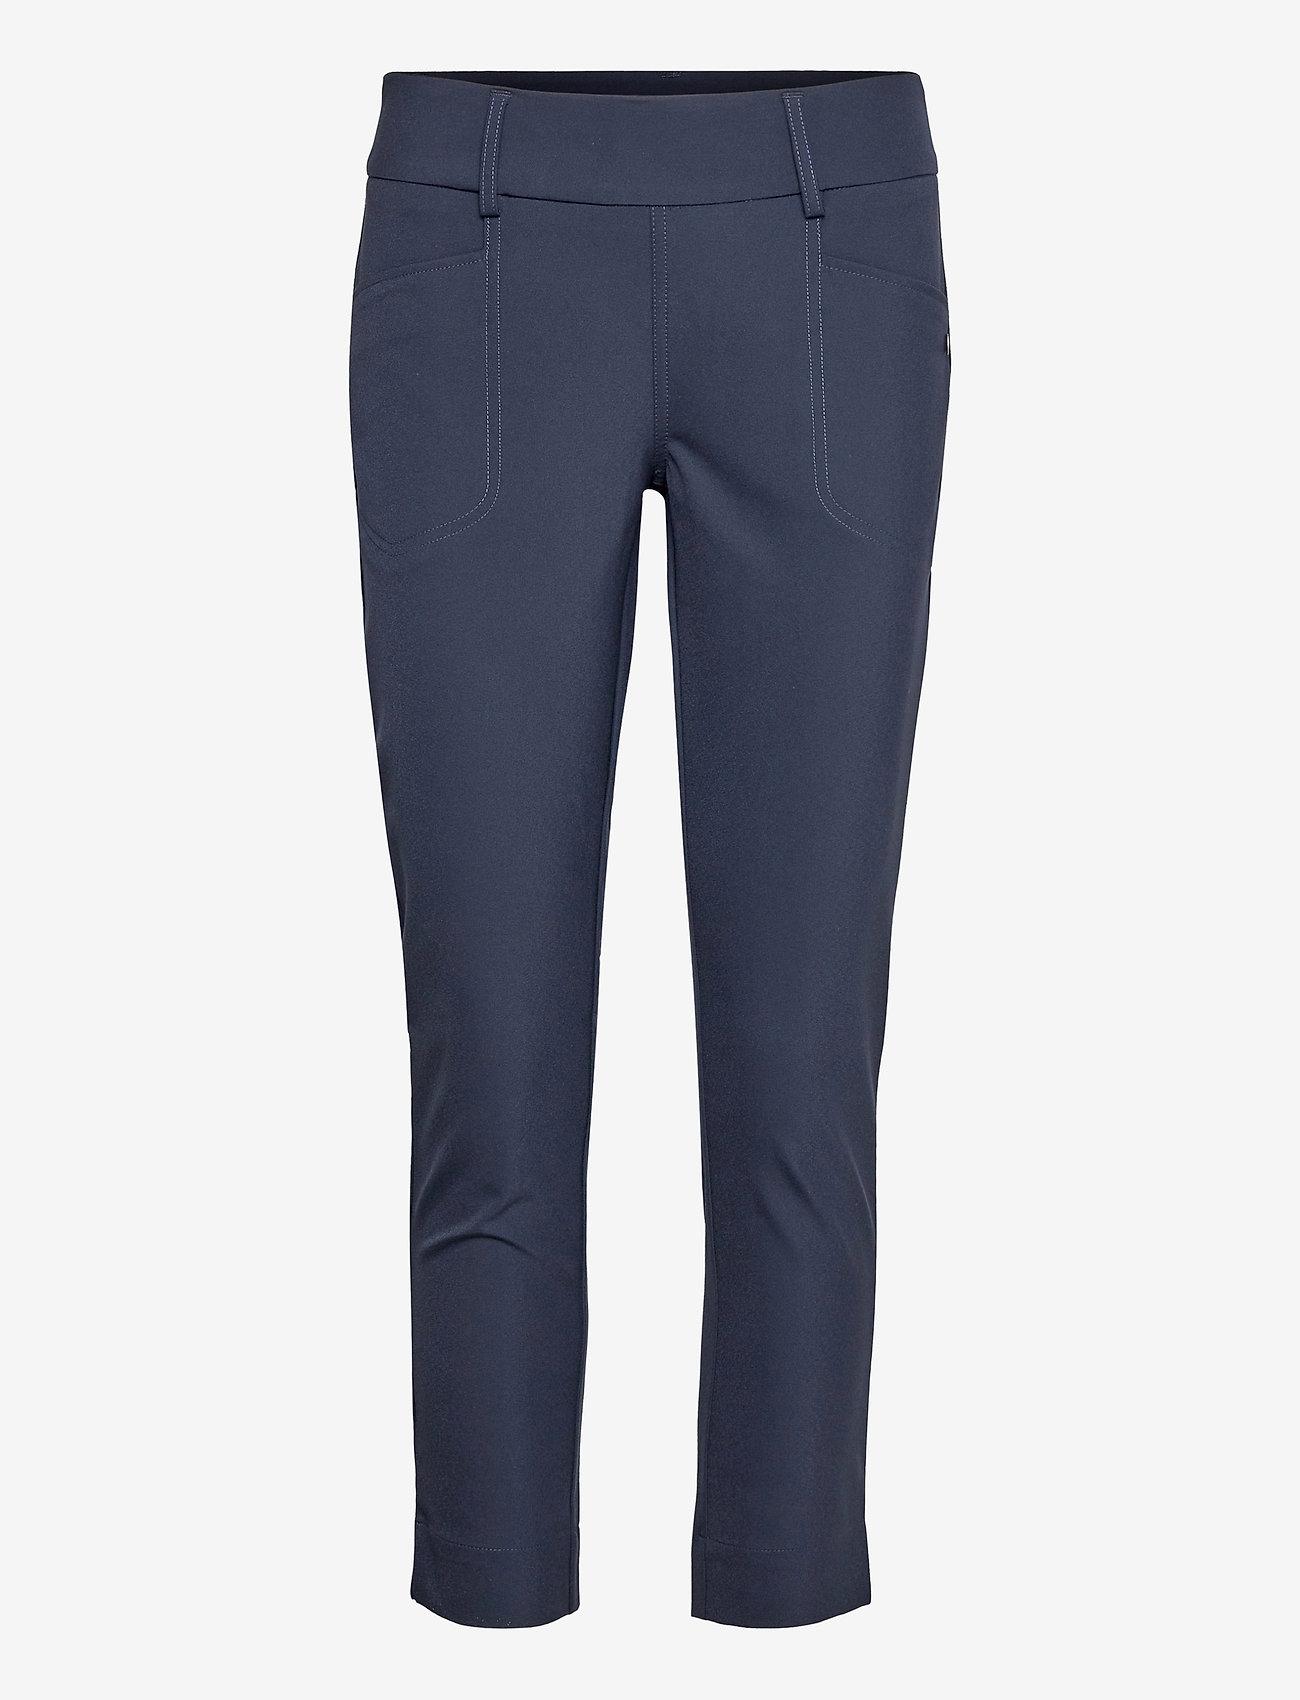 Abacus - Lds Grace 7/8 trousers 88cm - golfbroeken - navy - 0